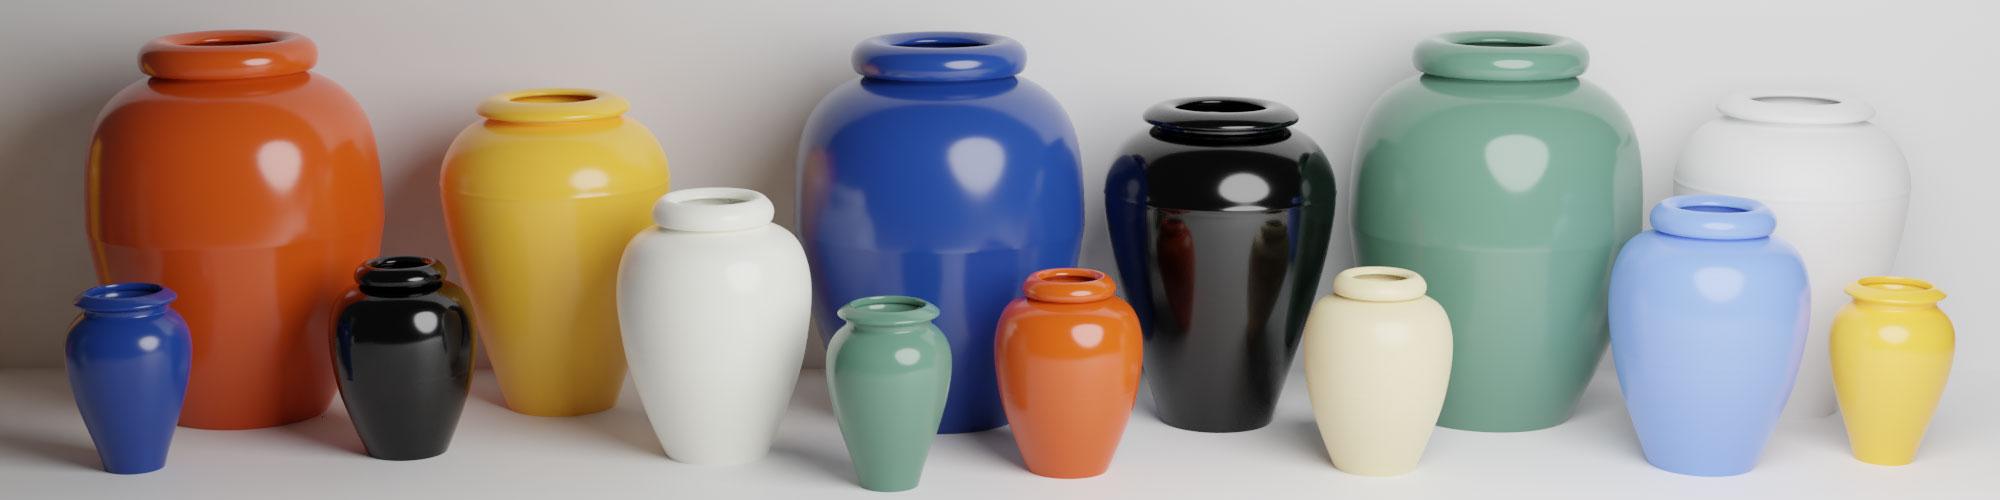 Bauer Pottery Oil Jars